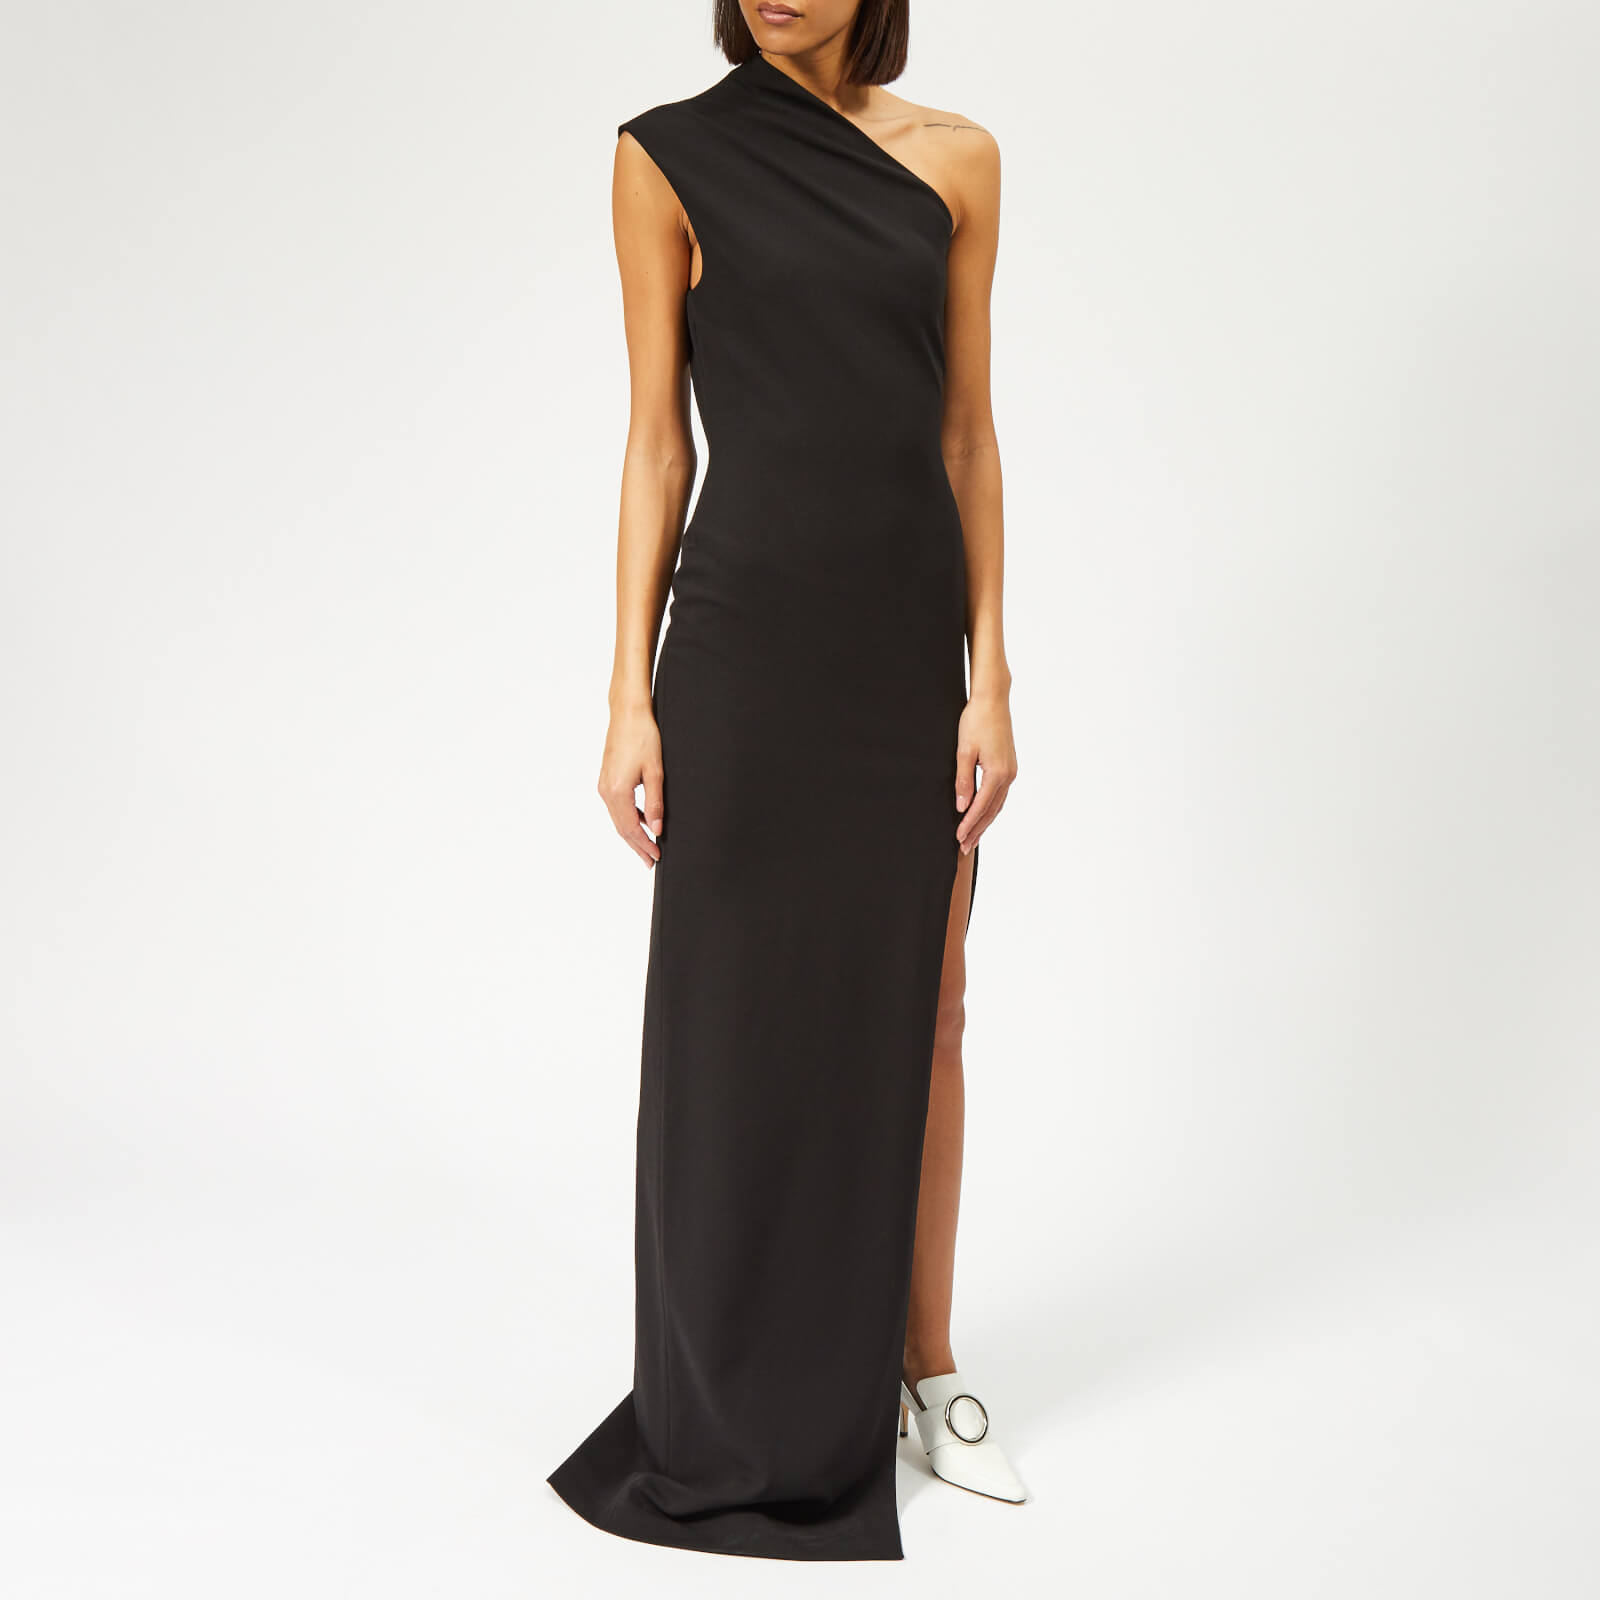 a1e3c91ac3 Solace London Women s Averie Maxi Dress - Black - Free UK Delivery ...